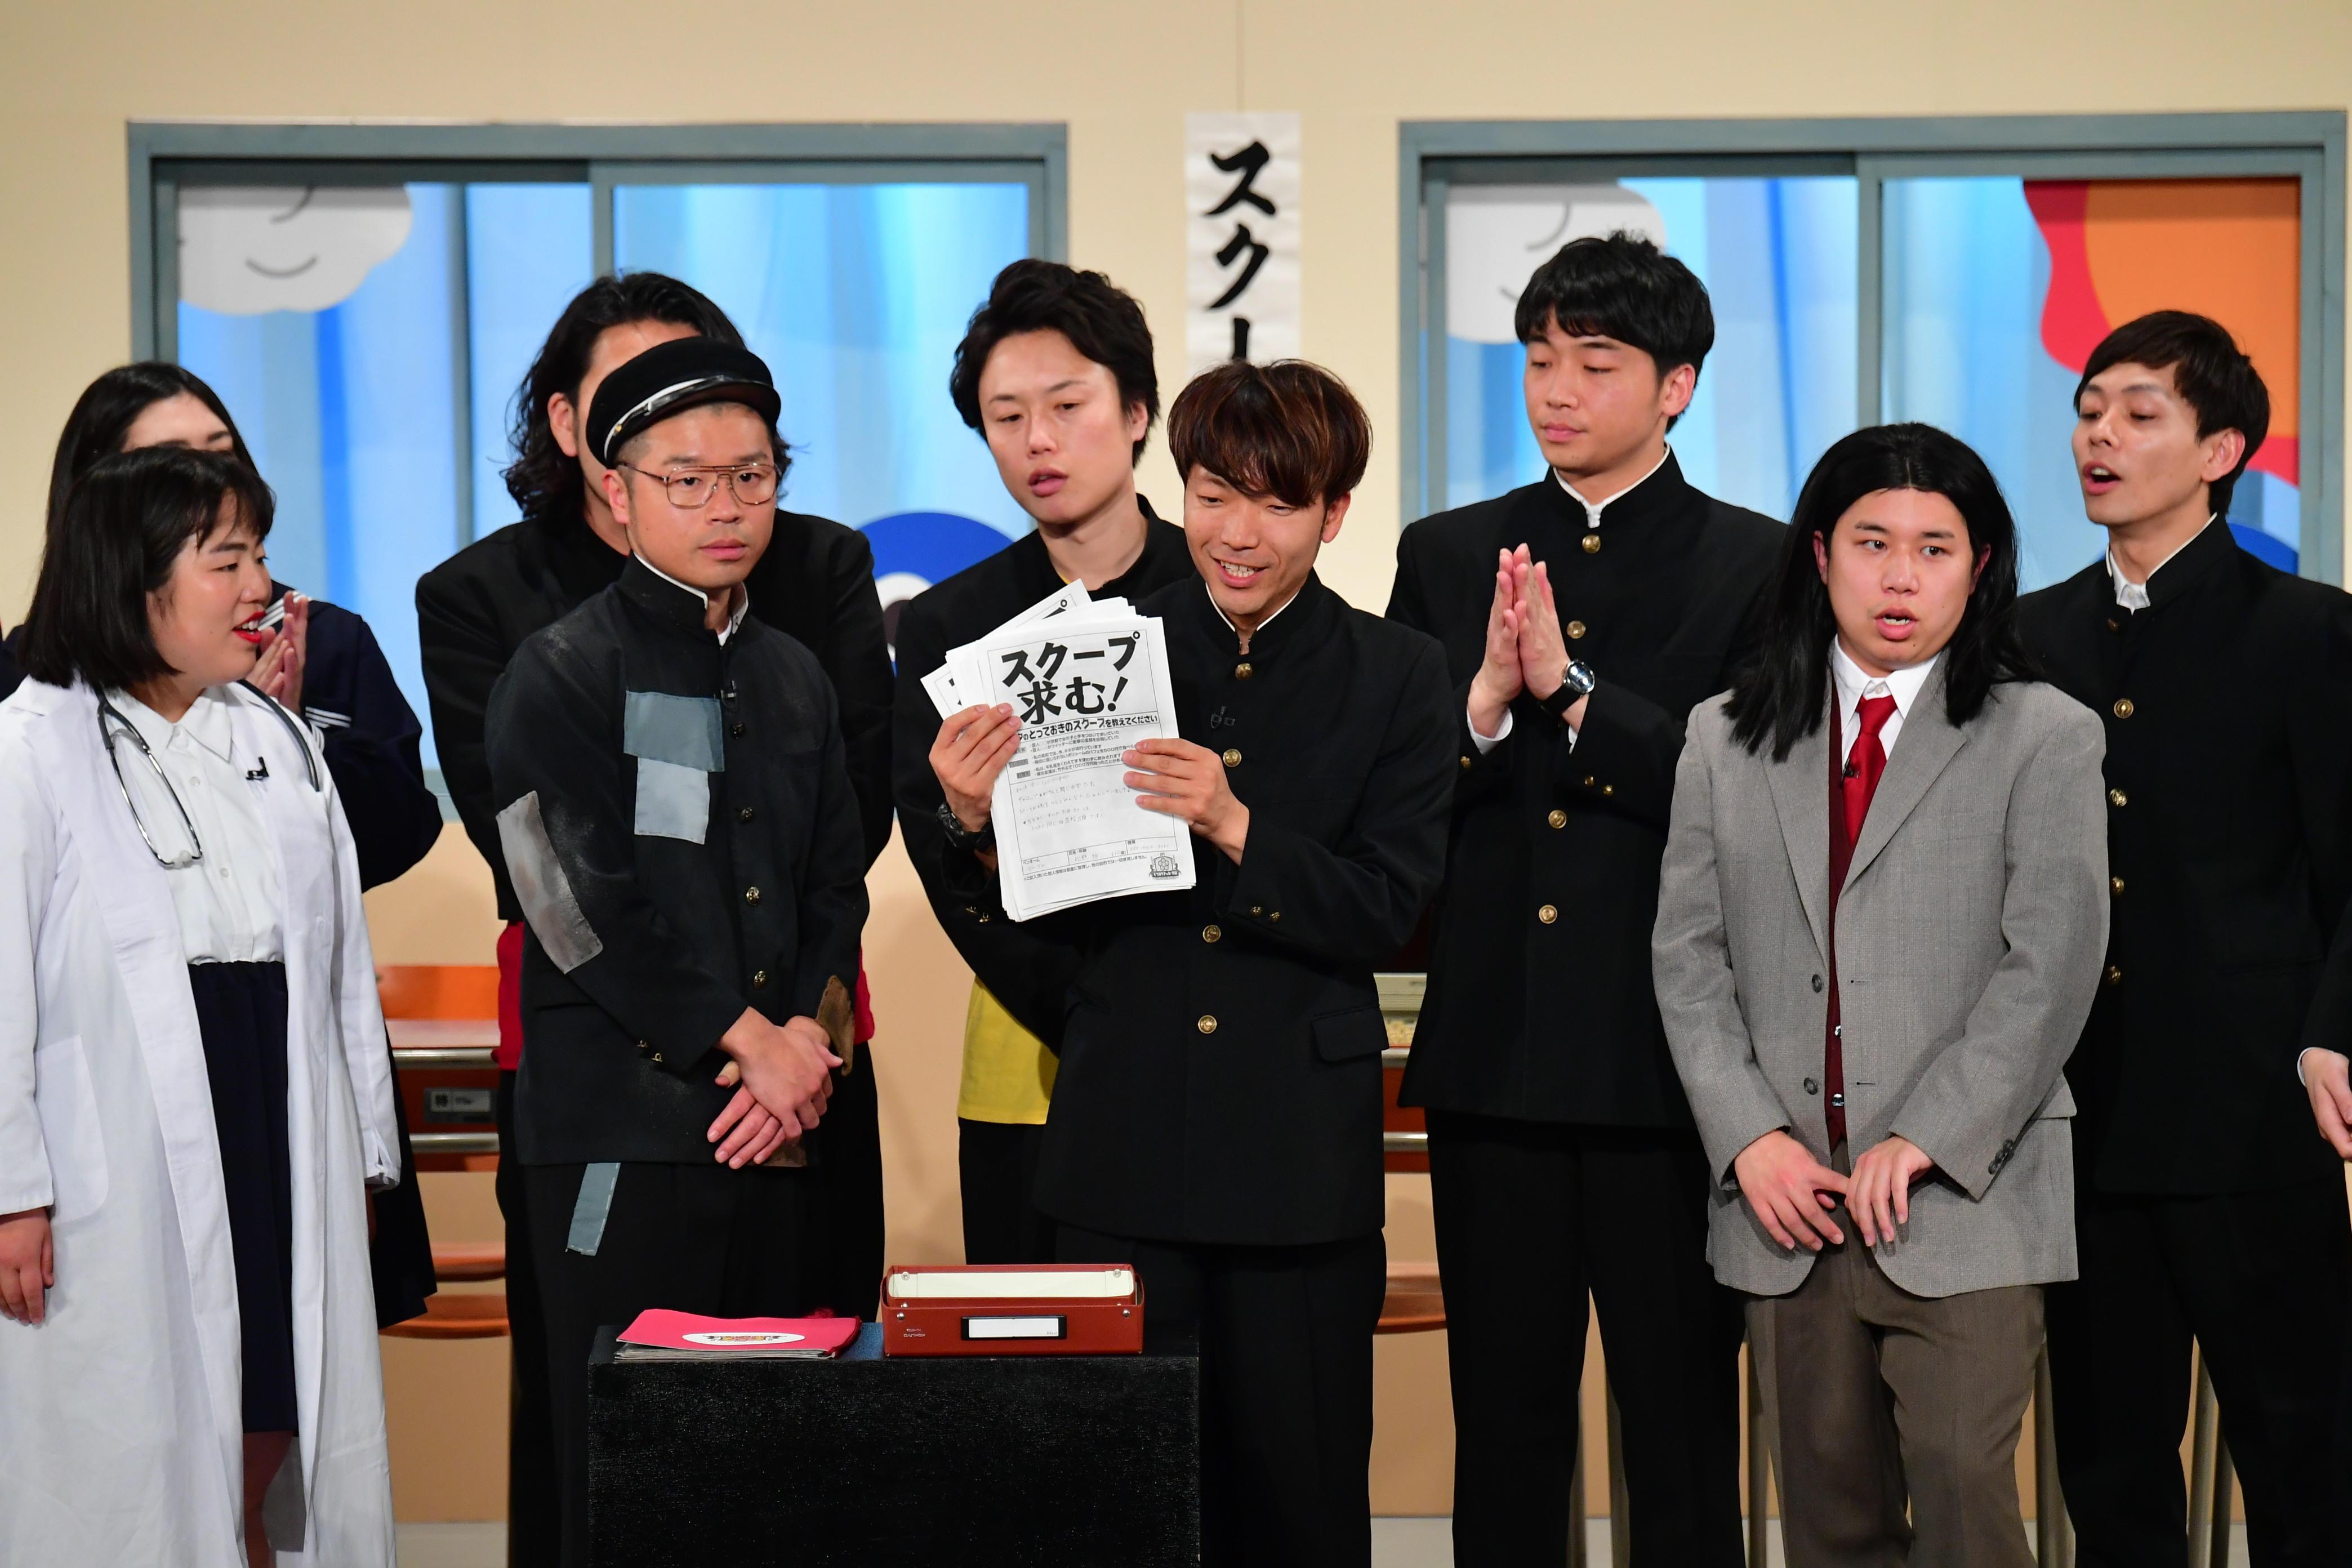 http://news.yoshimoto.co.jp/20181220091053-cecbc534dc00a669f9f3d03b38c053970a139b3c.jpg